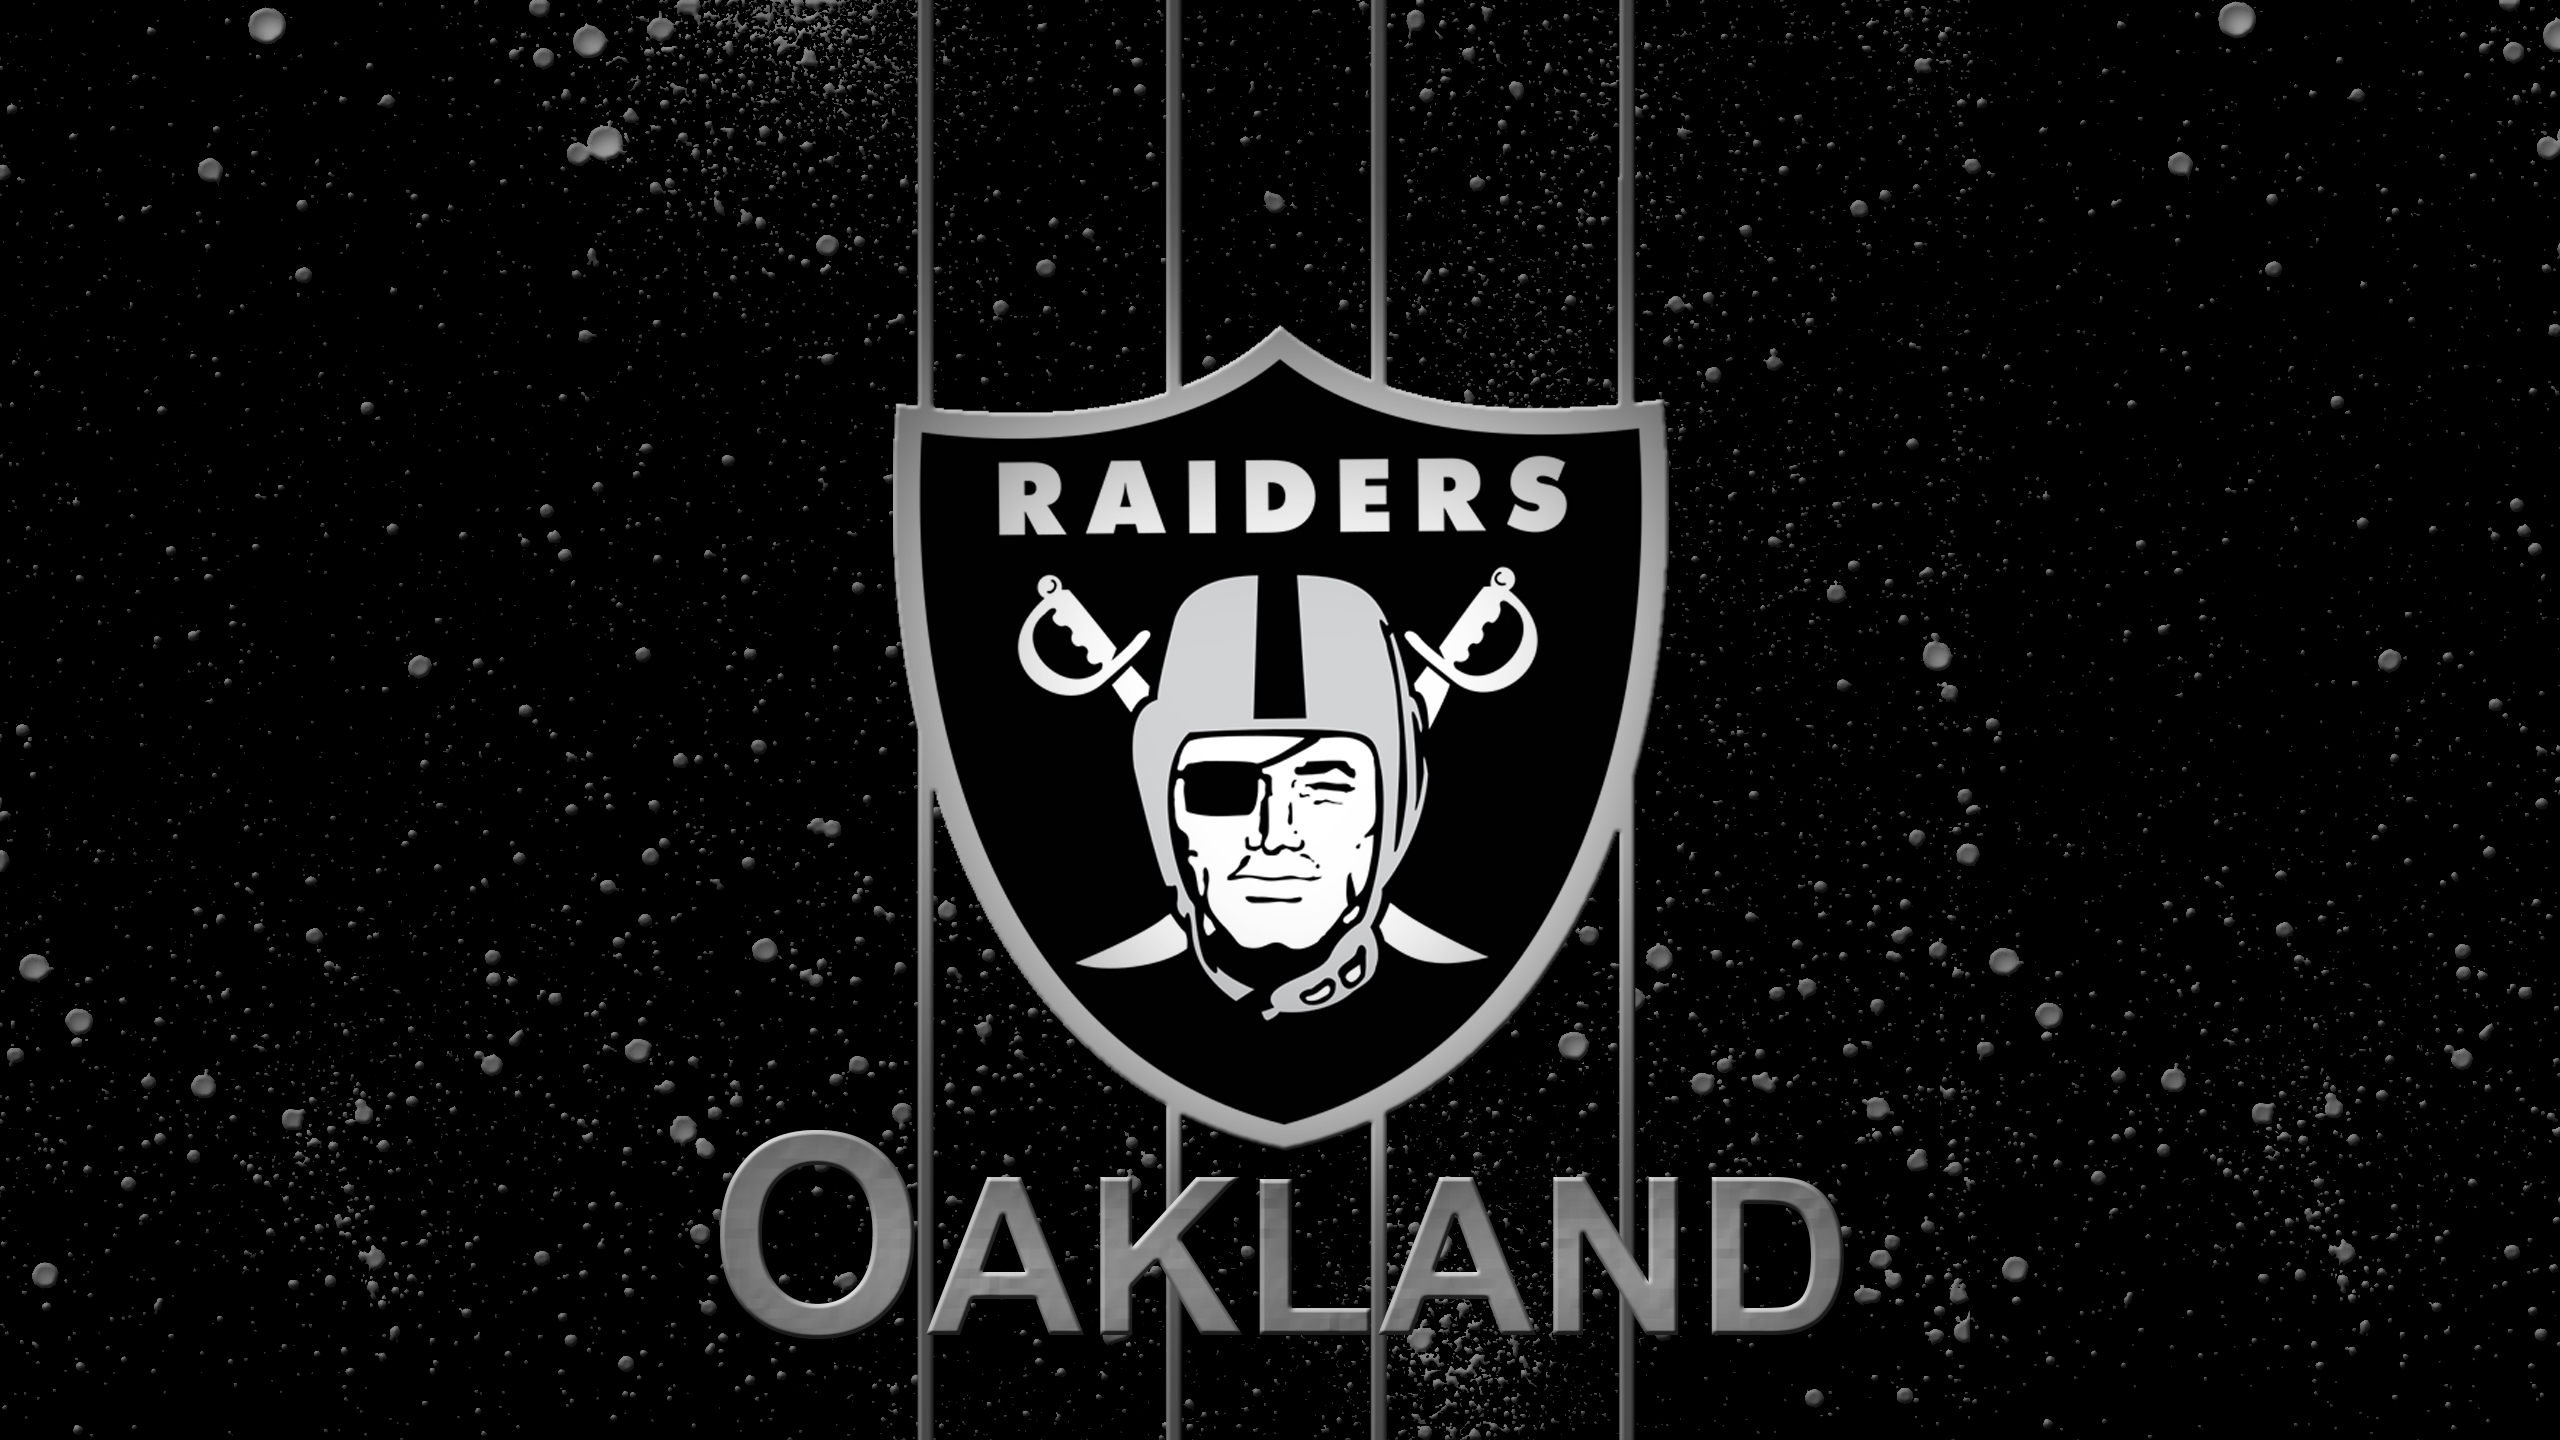 Oakland Raiders By Beaware8 On Deviantart